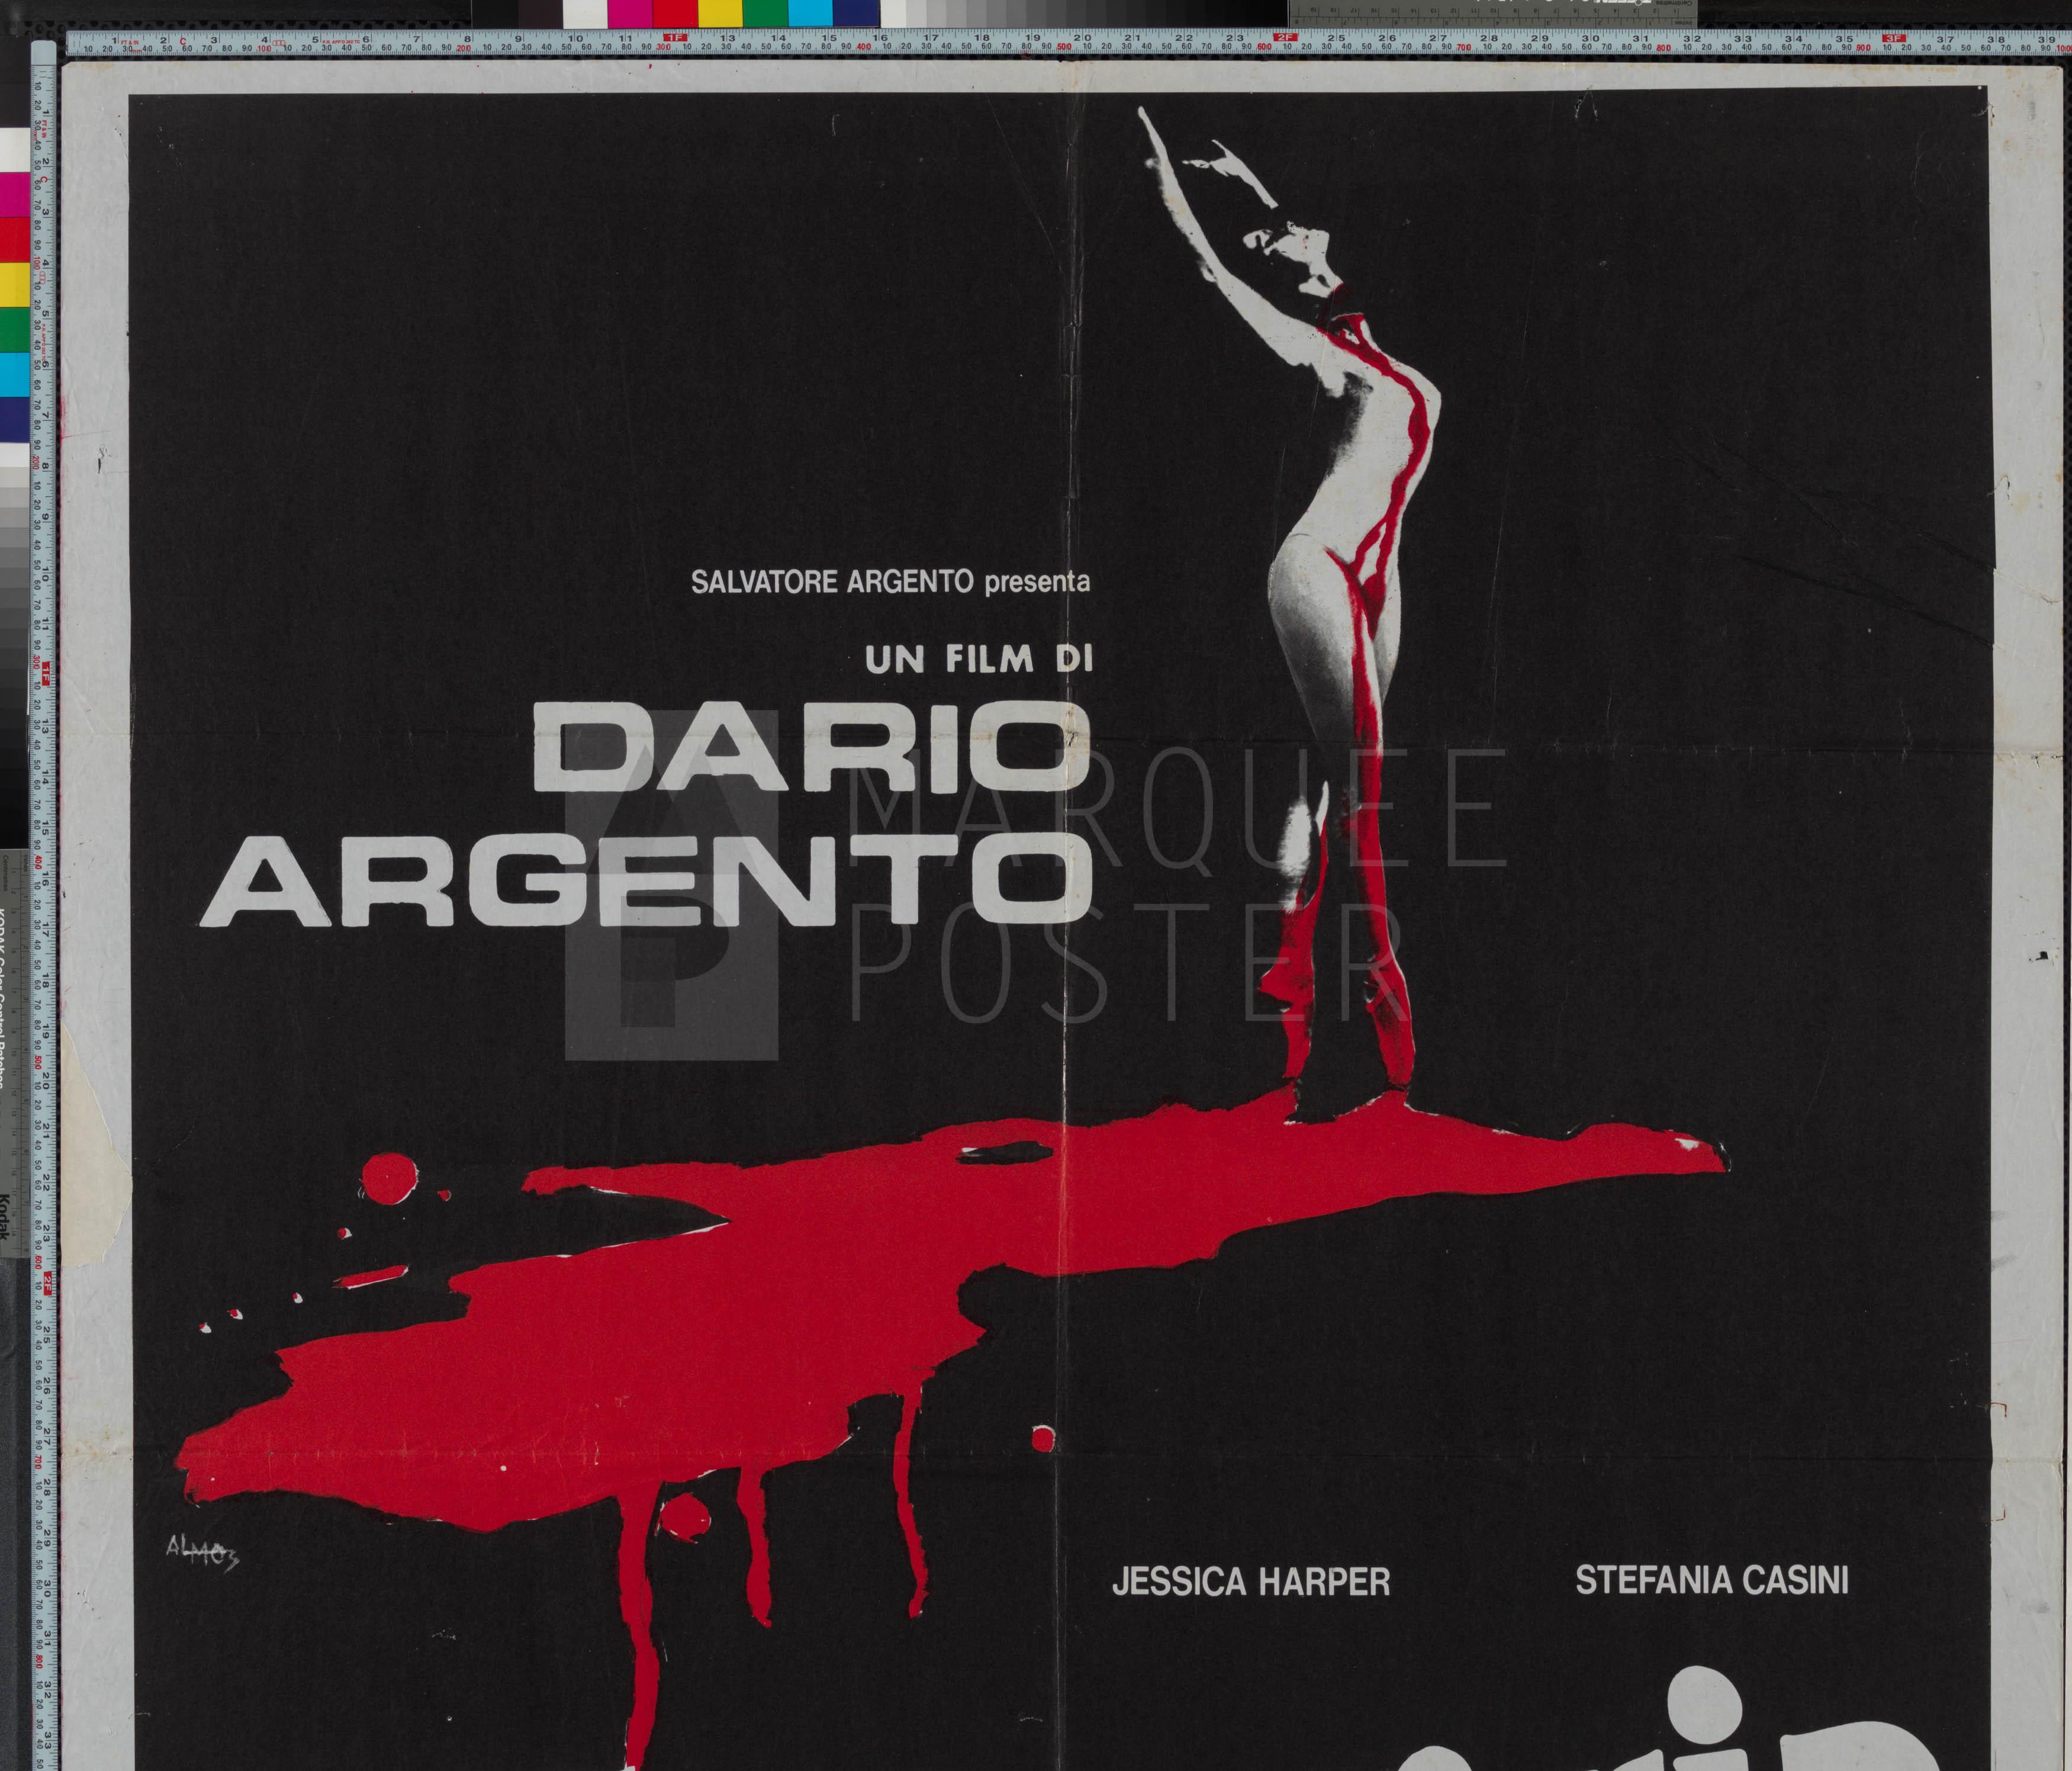 110-suspiria-ballet-style-italian-2-foglio-1977-02